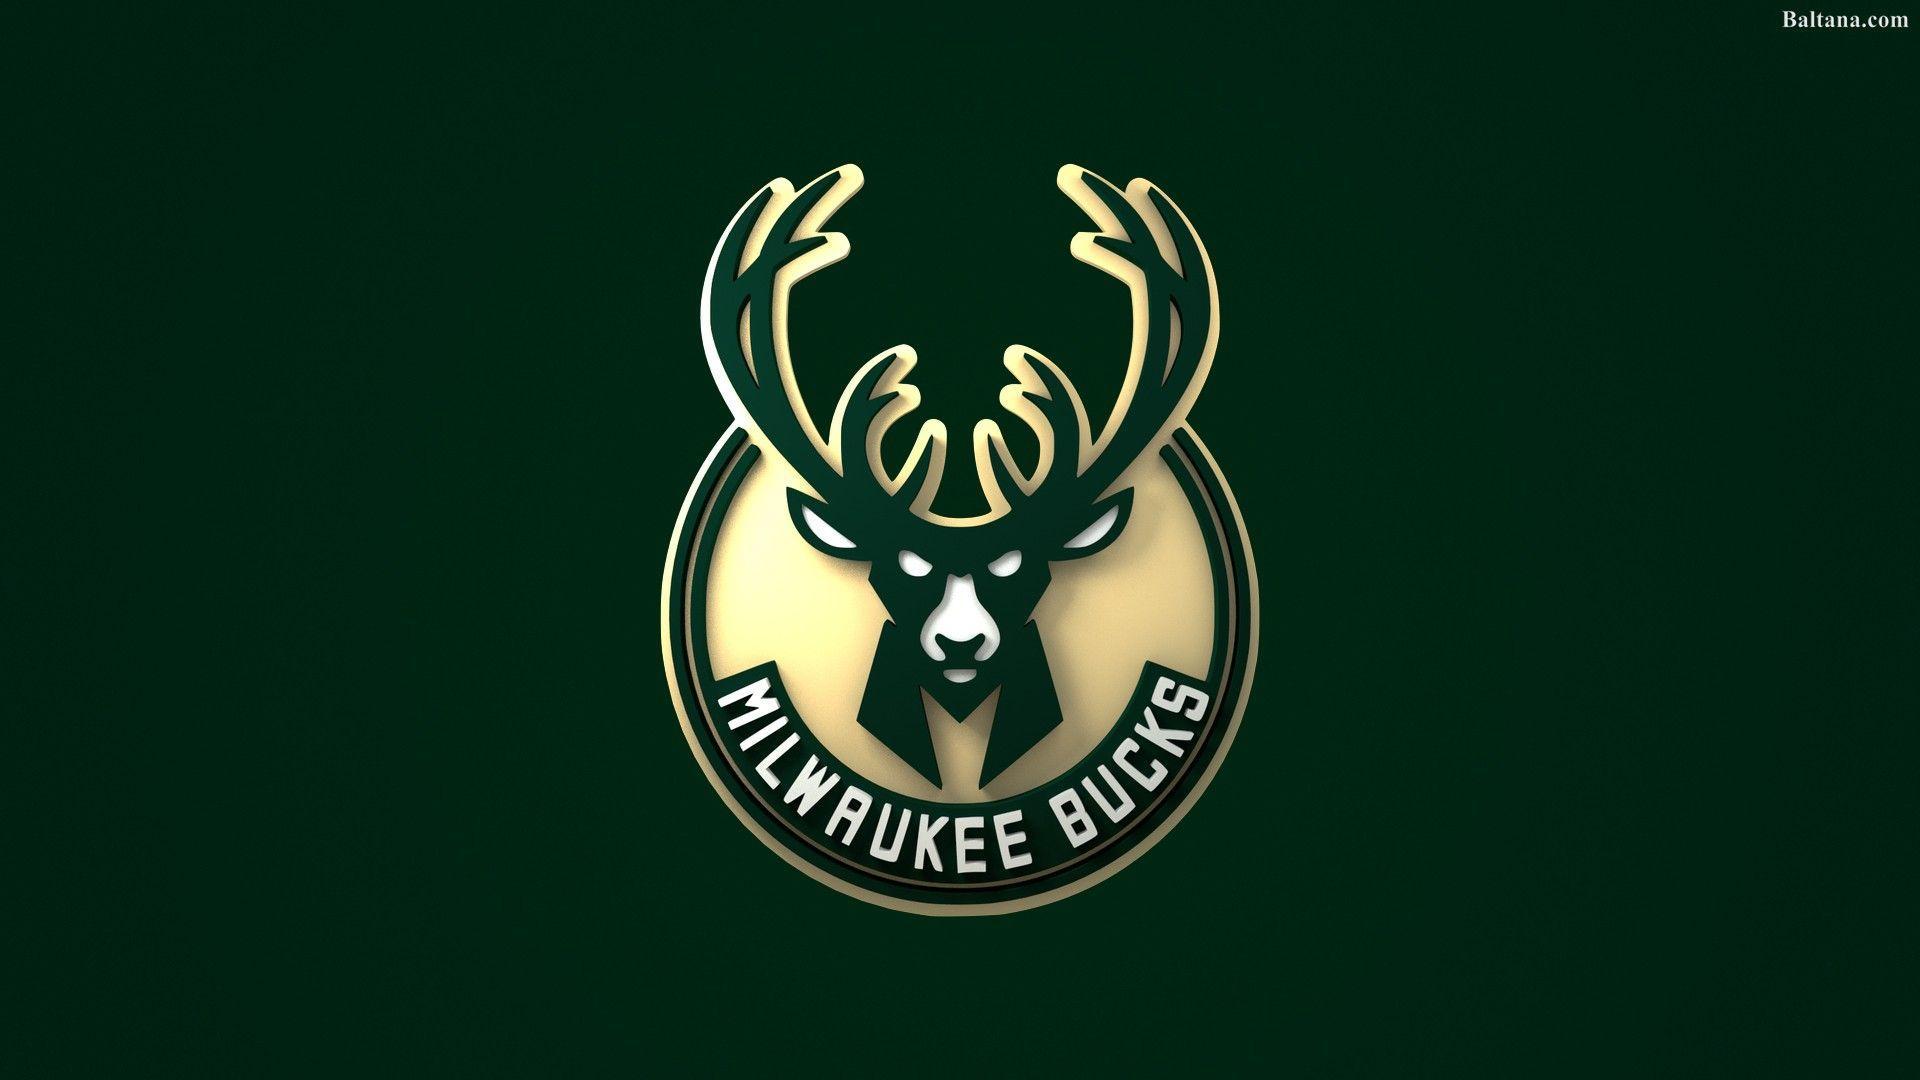 Milwaukee Bucks Wallpapers - Top Free Milwaukee Bucks ...